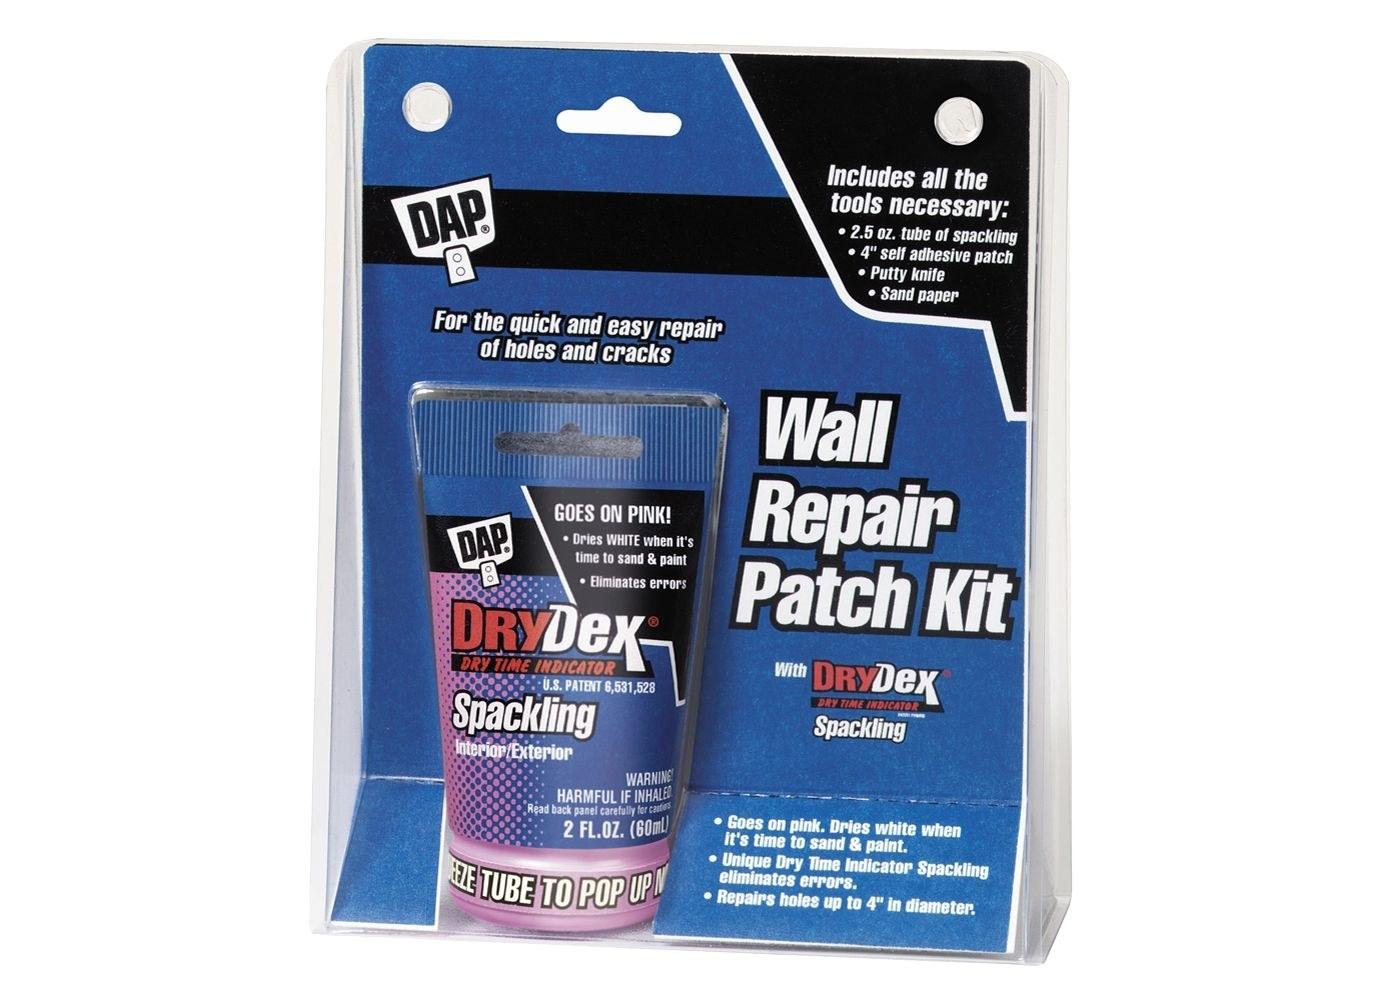 the DAP wall repair patch kit